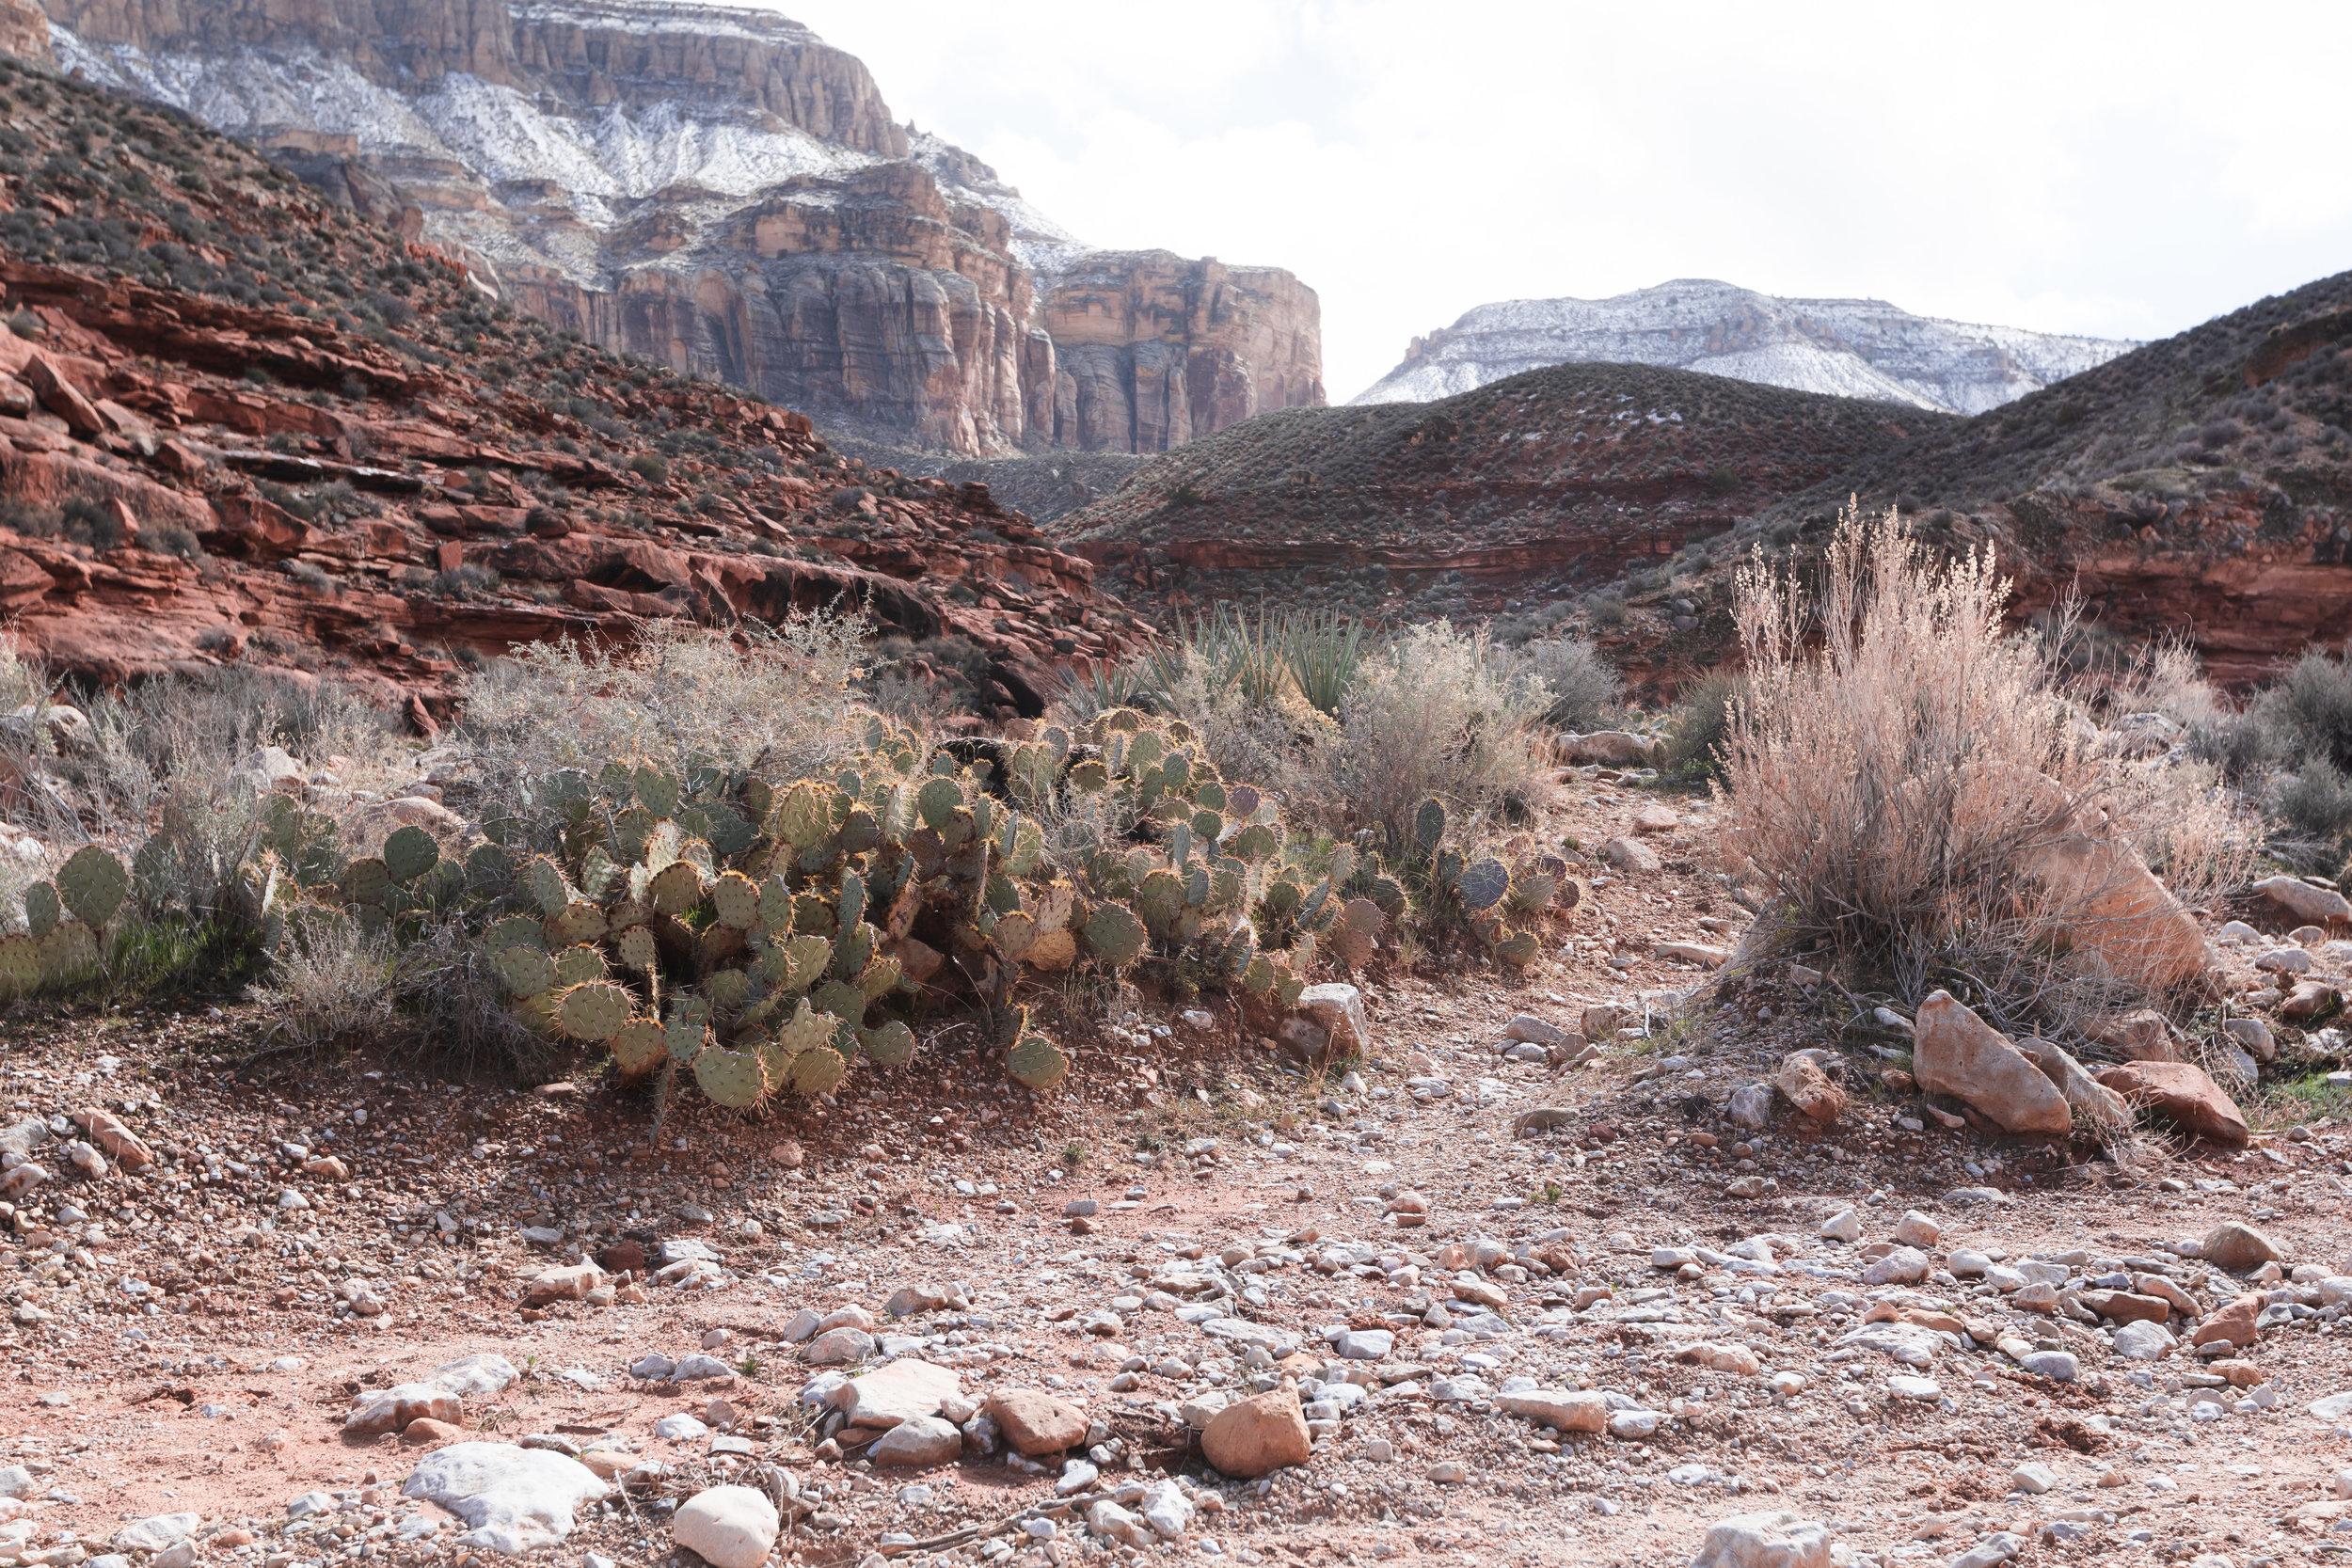 Hiking down the canyon toward the Havasupai Campground.